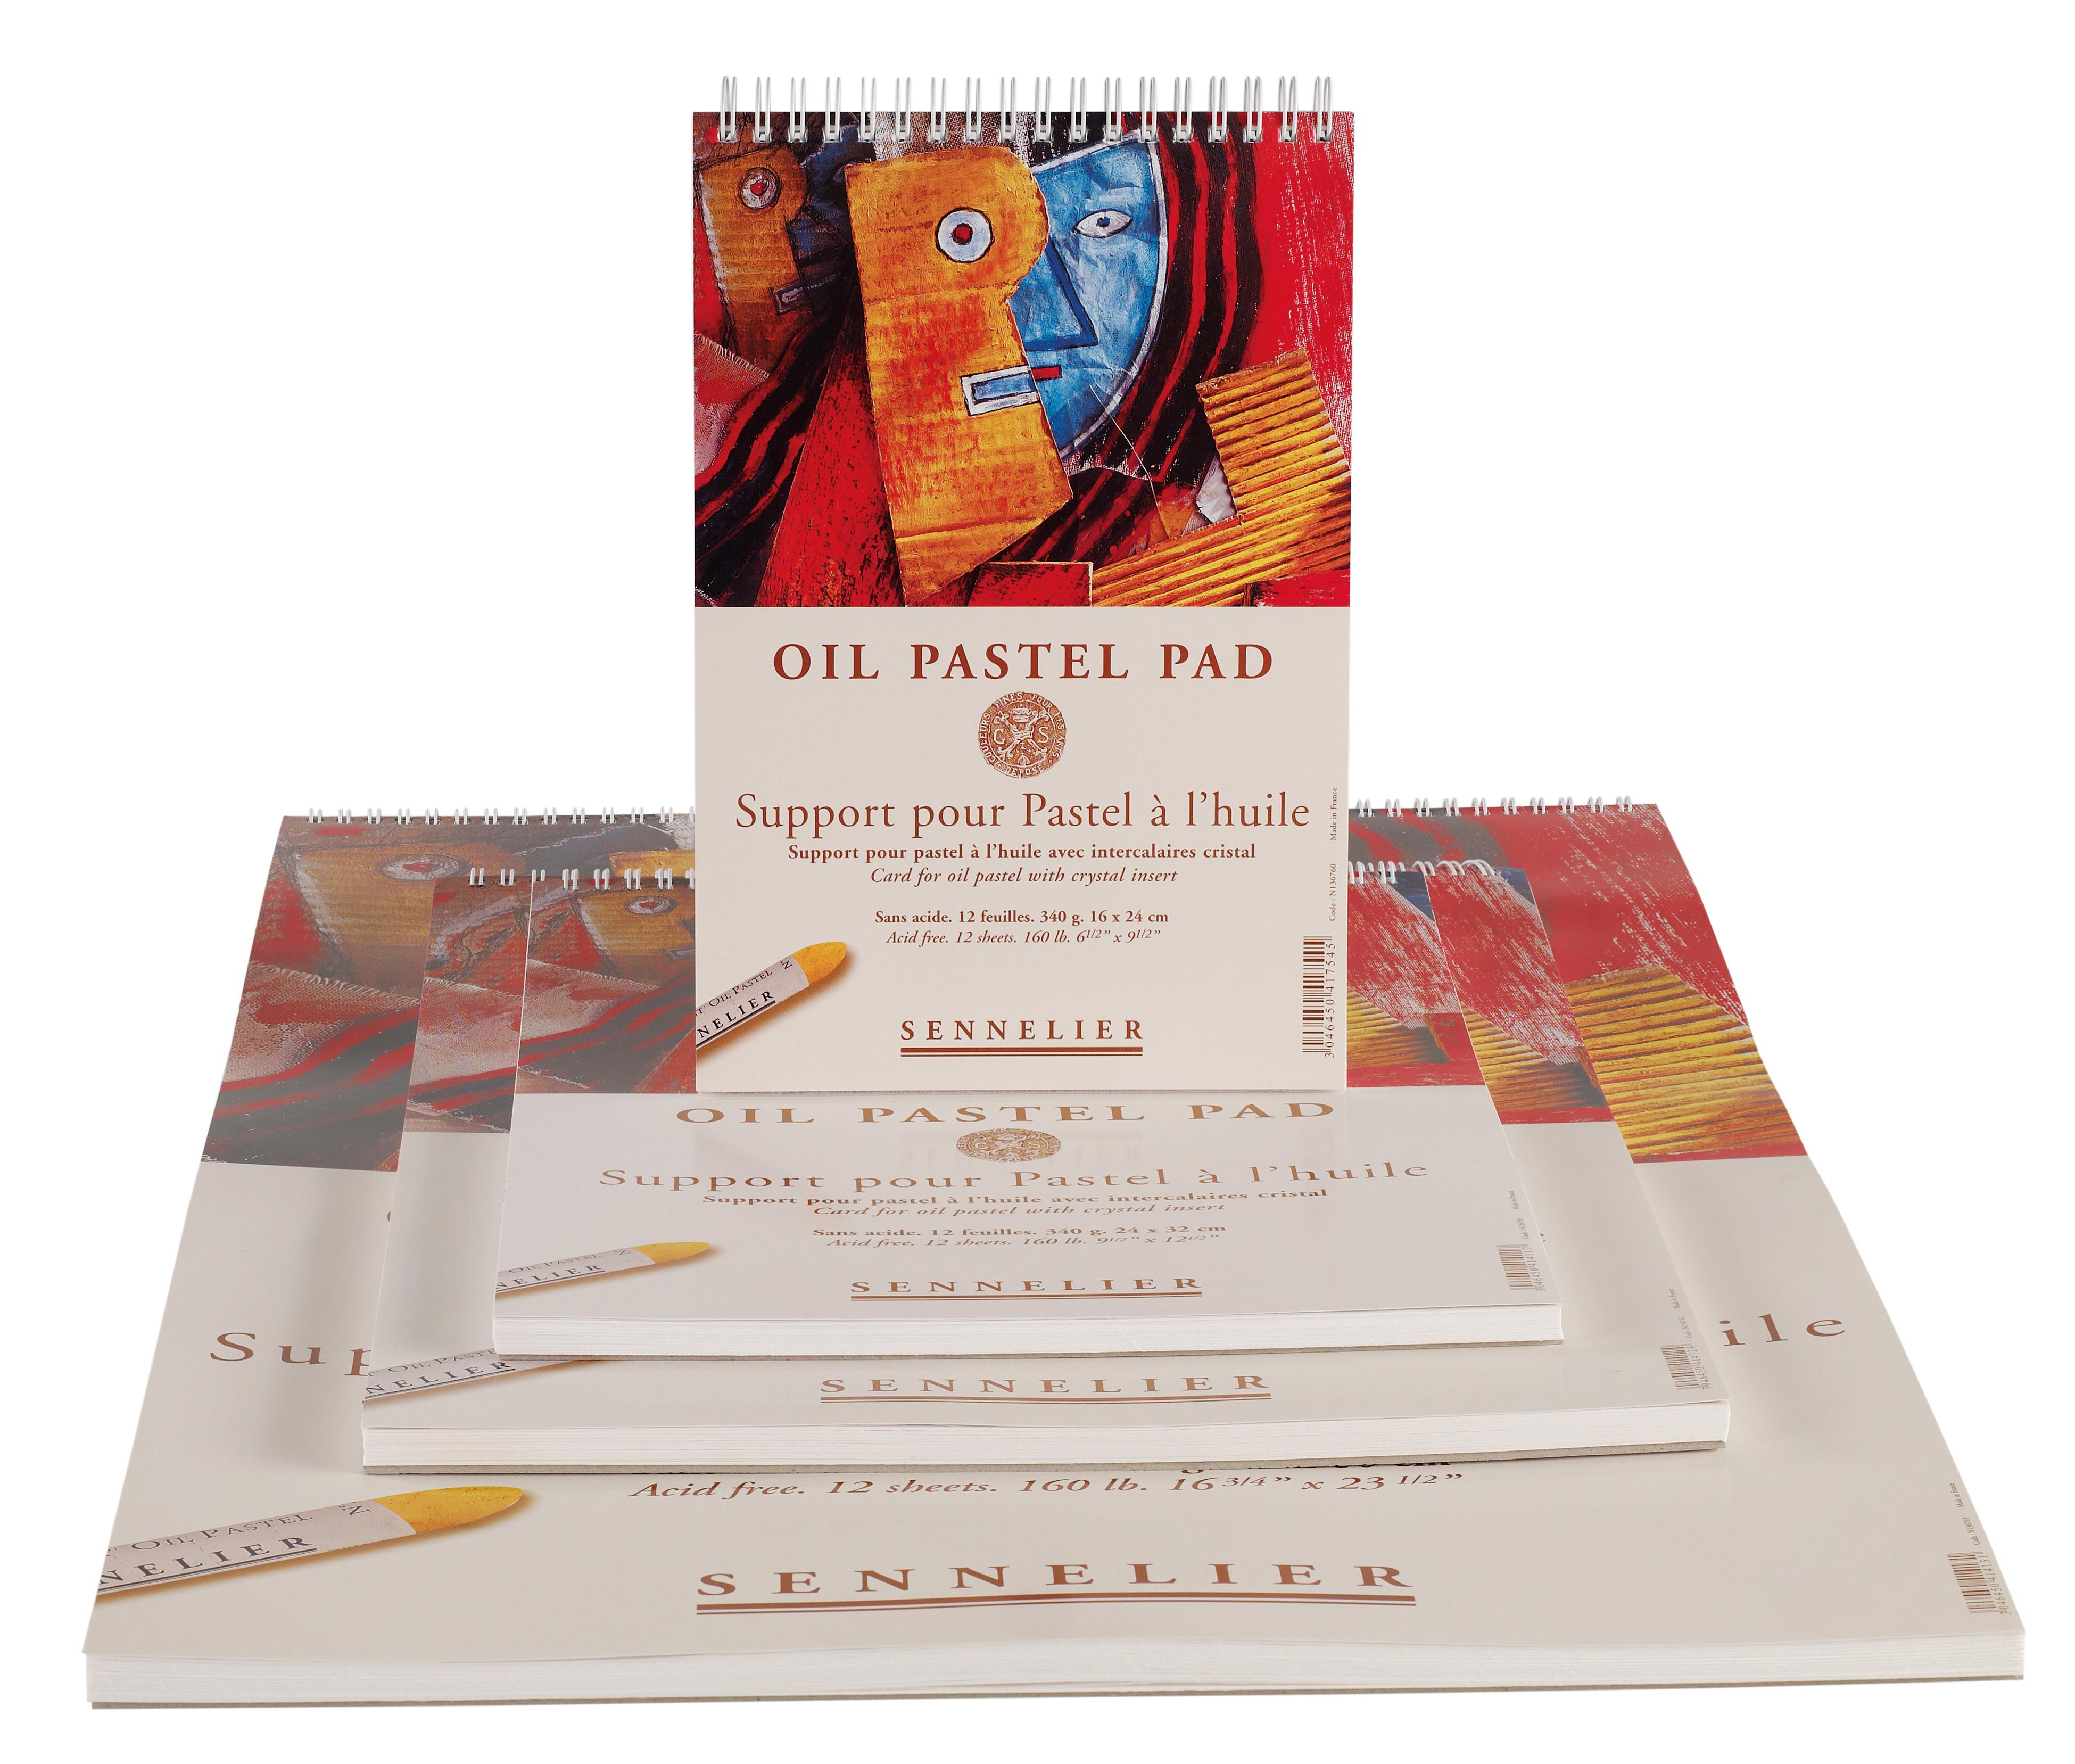 Oil Pastel Pads